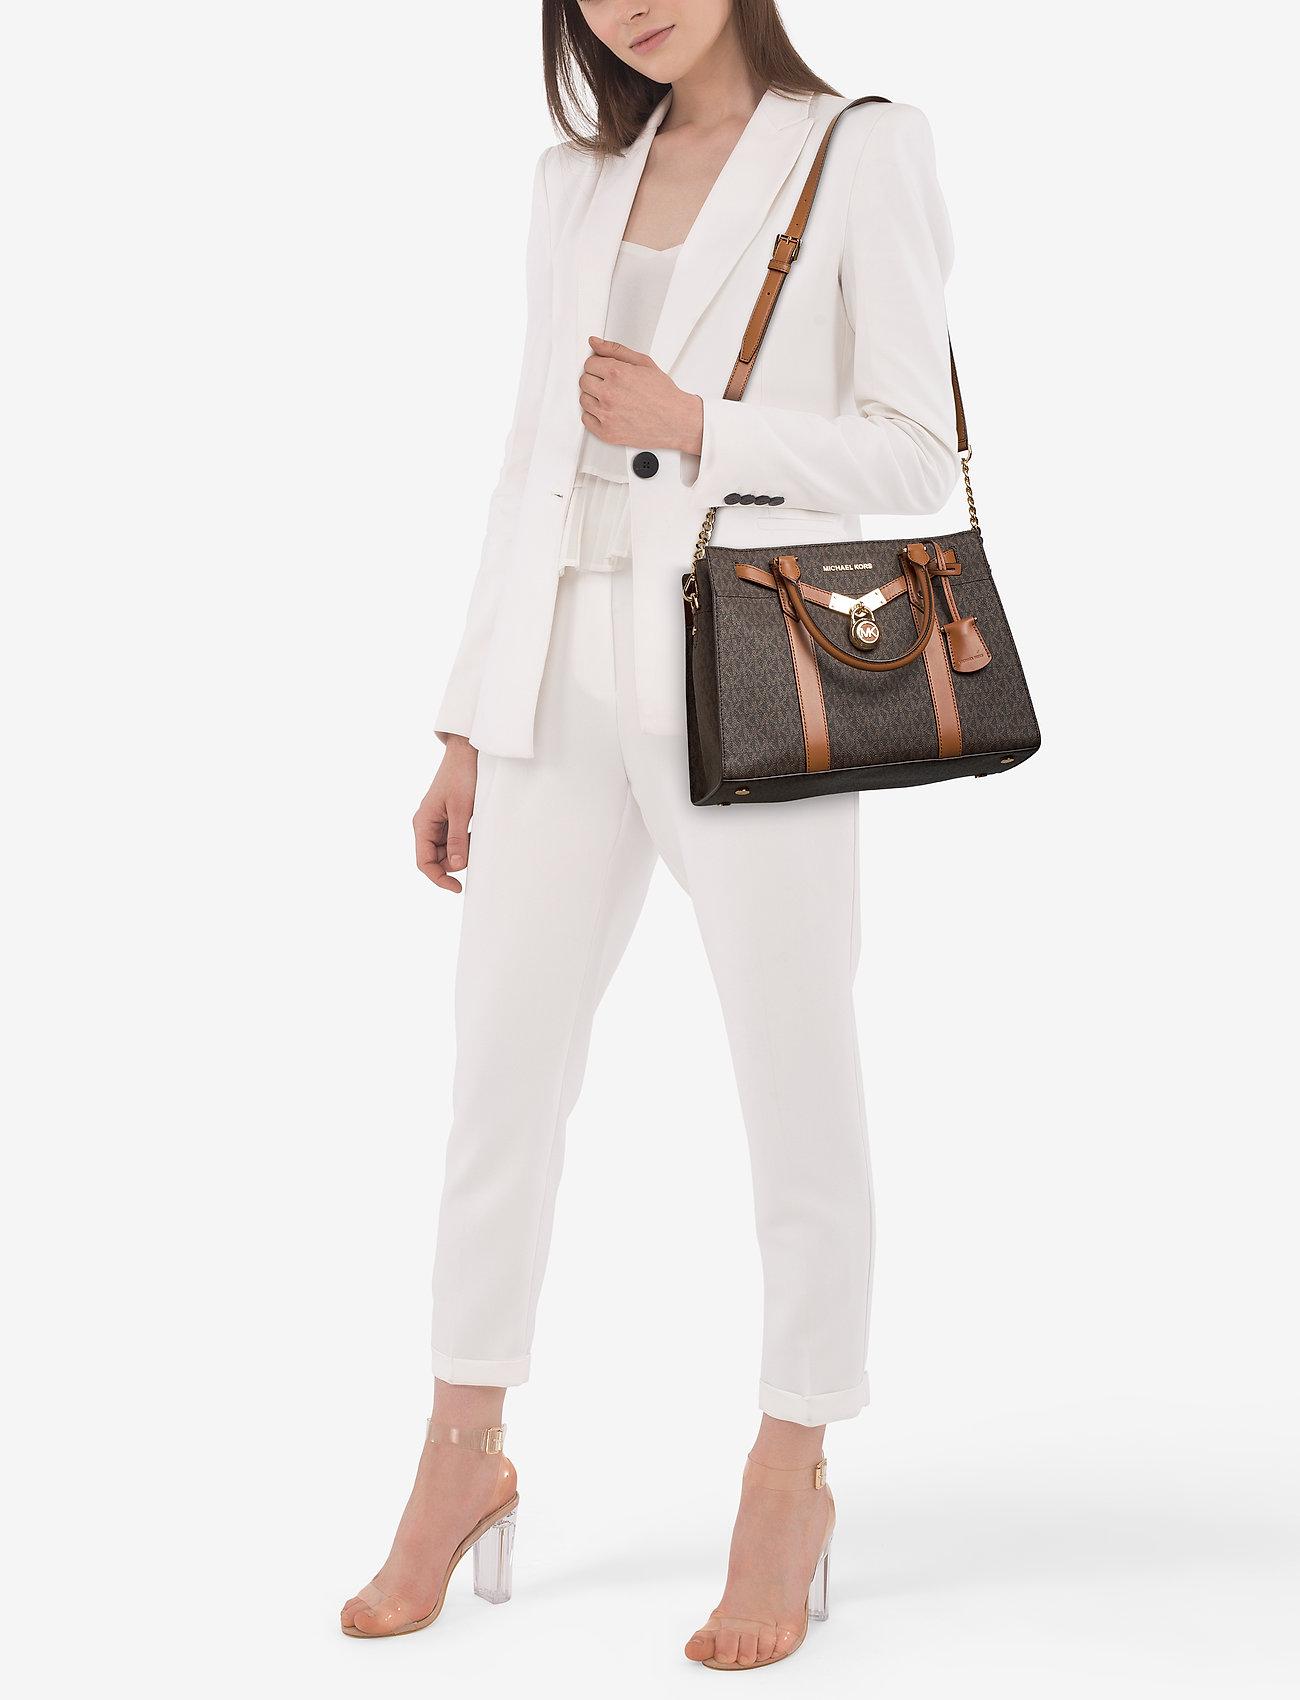 Michael Kors Bags LG SATCHEL - BRN/ACORN